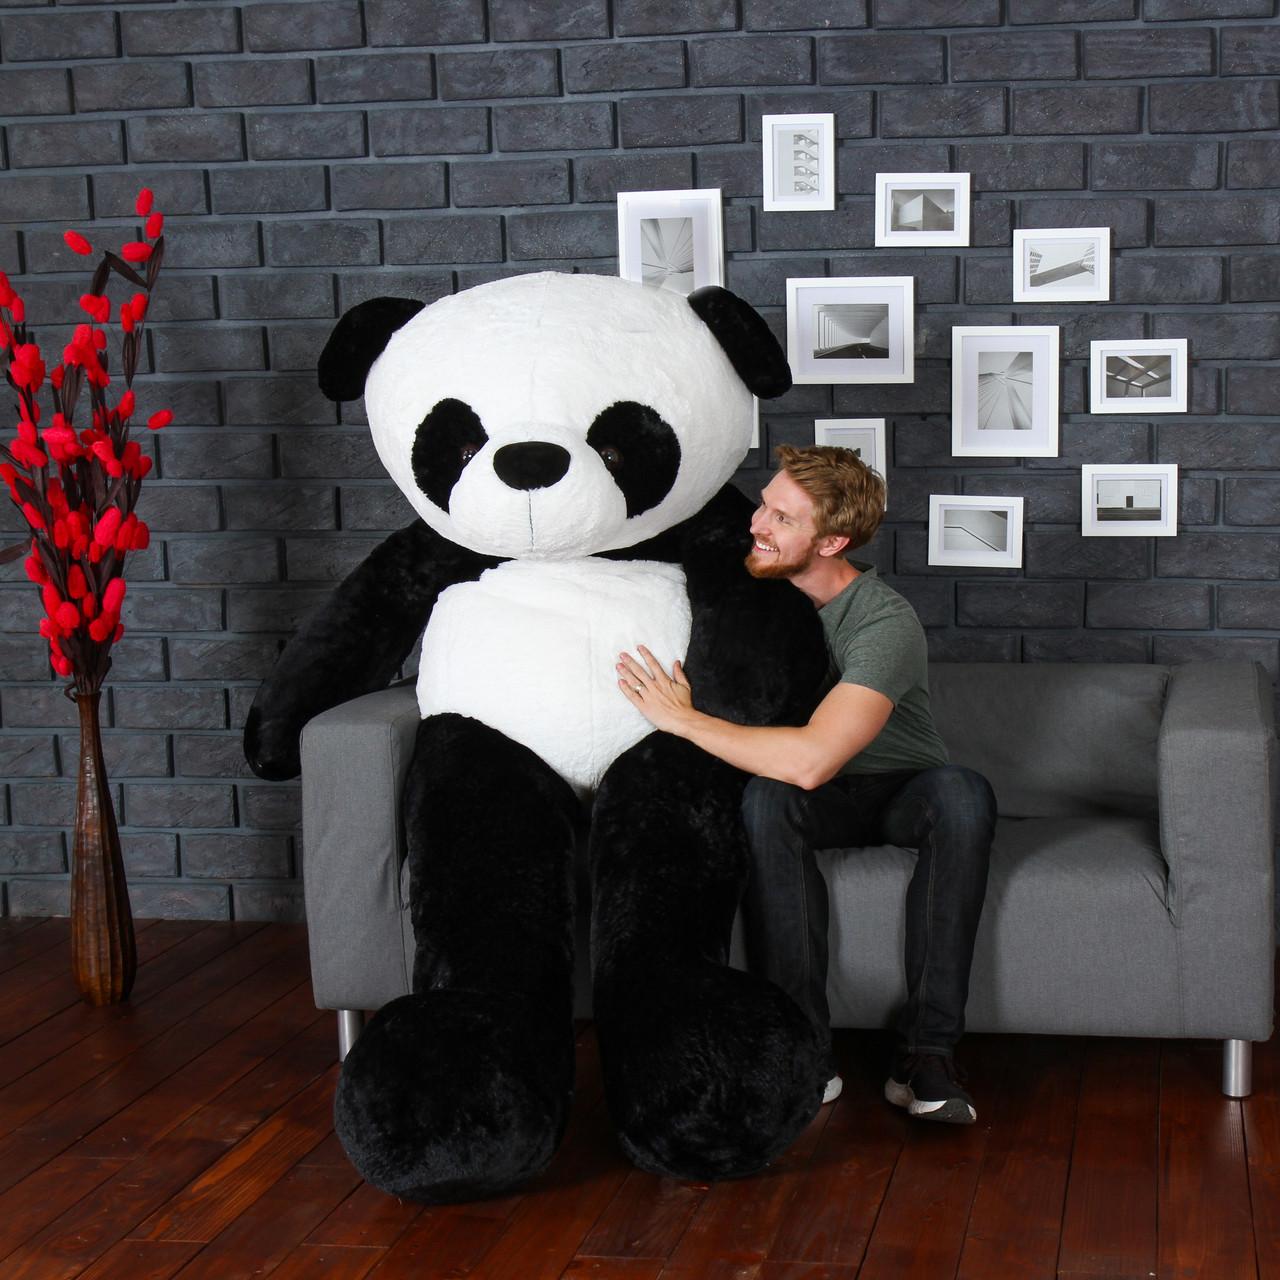 Super Soft Giant Stuffed Panda Big Push Animal Toy - 7 Foot High Quality Teddy Bear